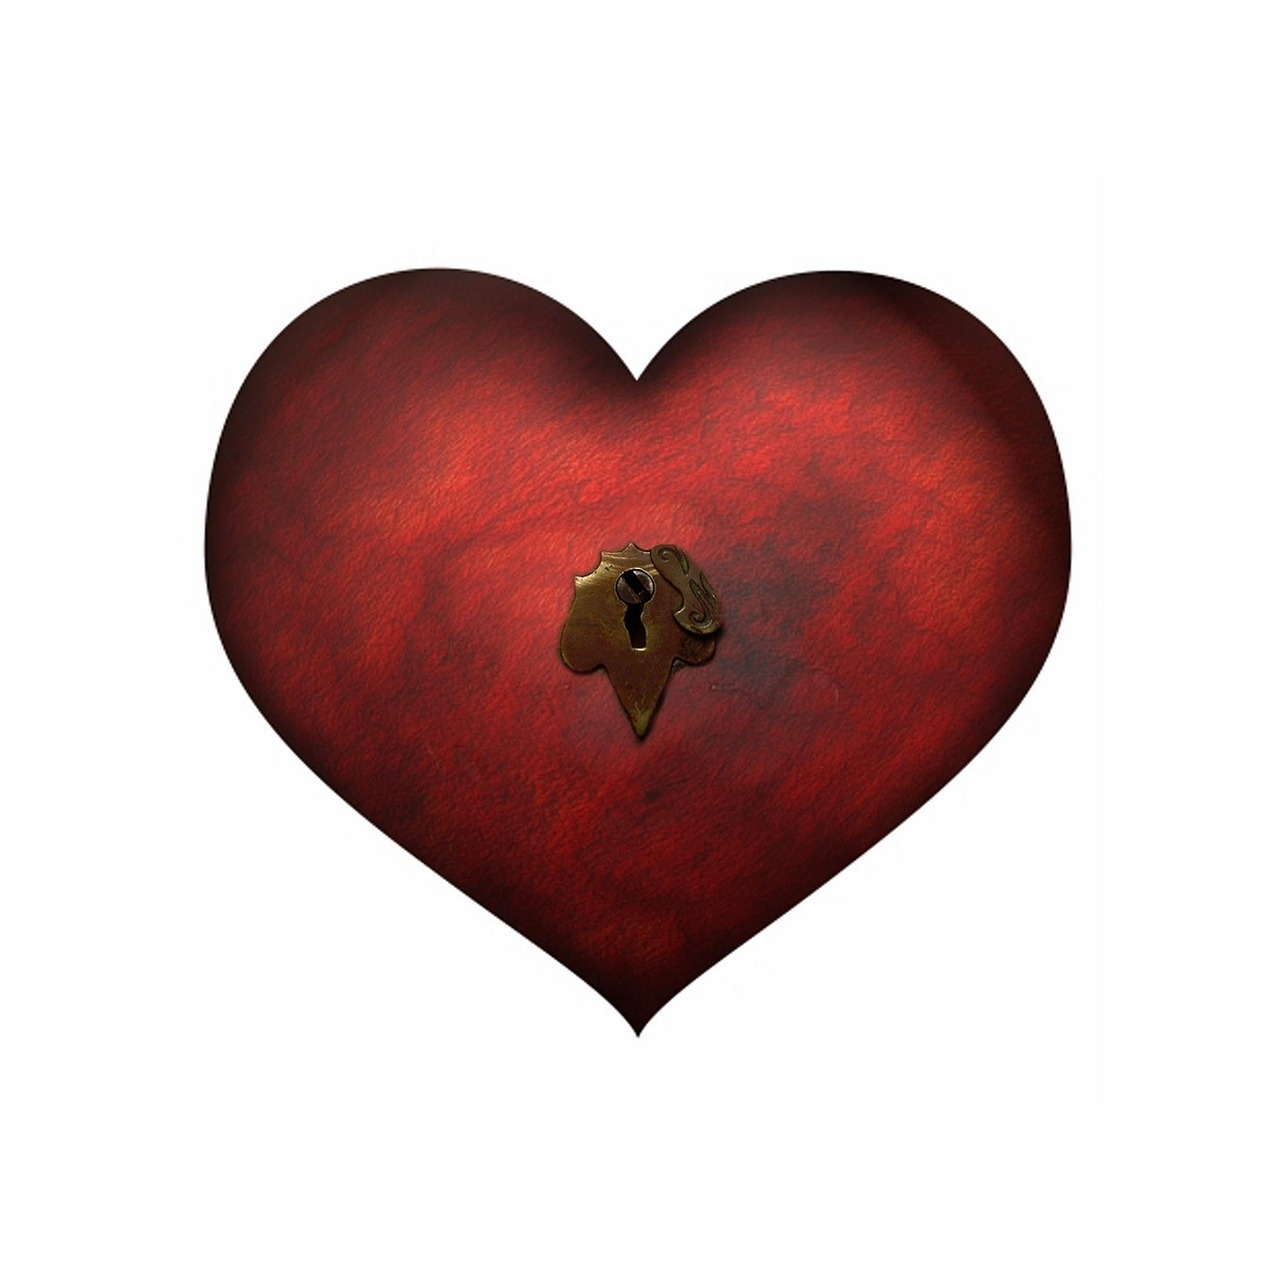 heart-650293_1280